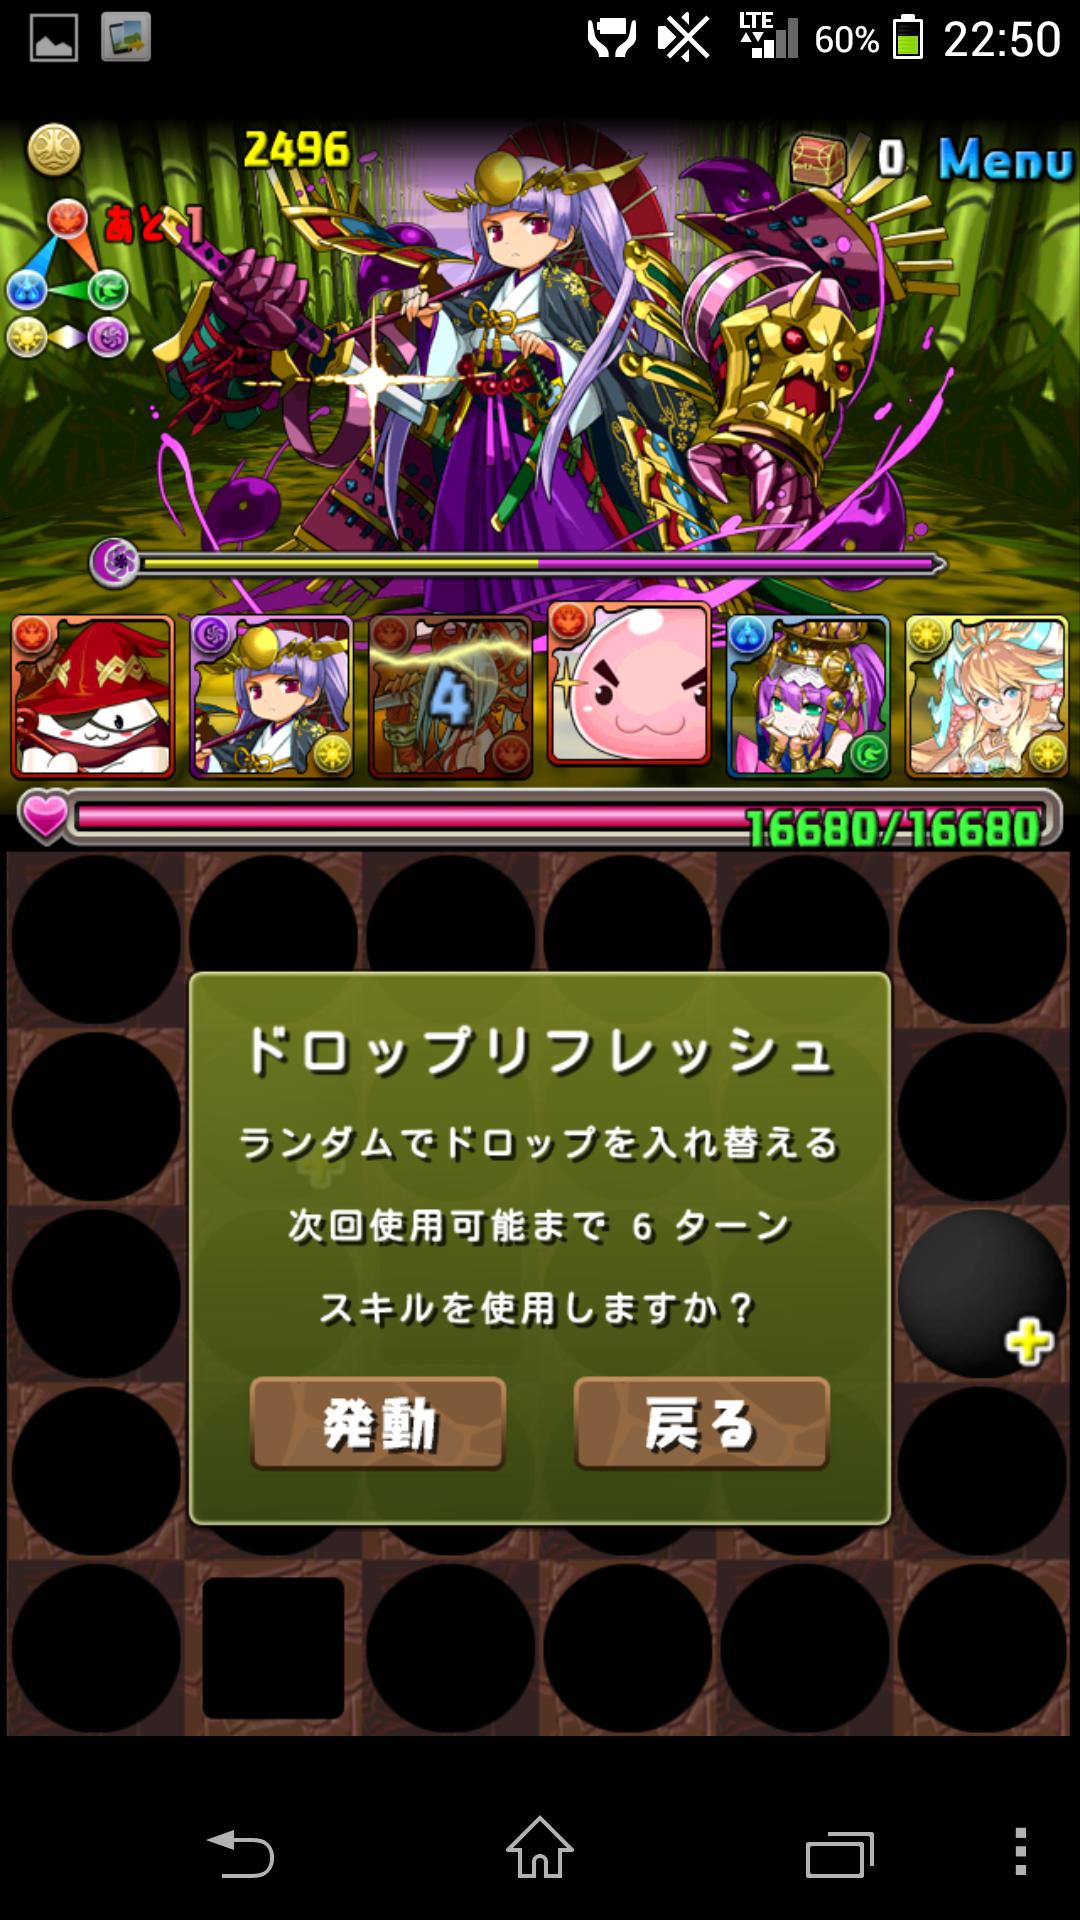 Screenshot_2014-05-22-22-50-31.png